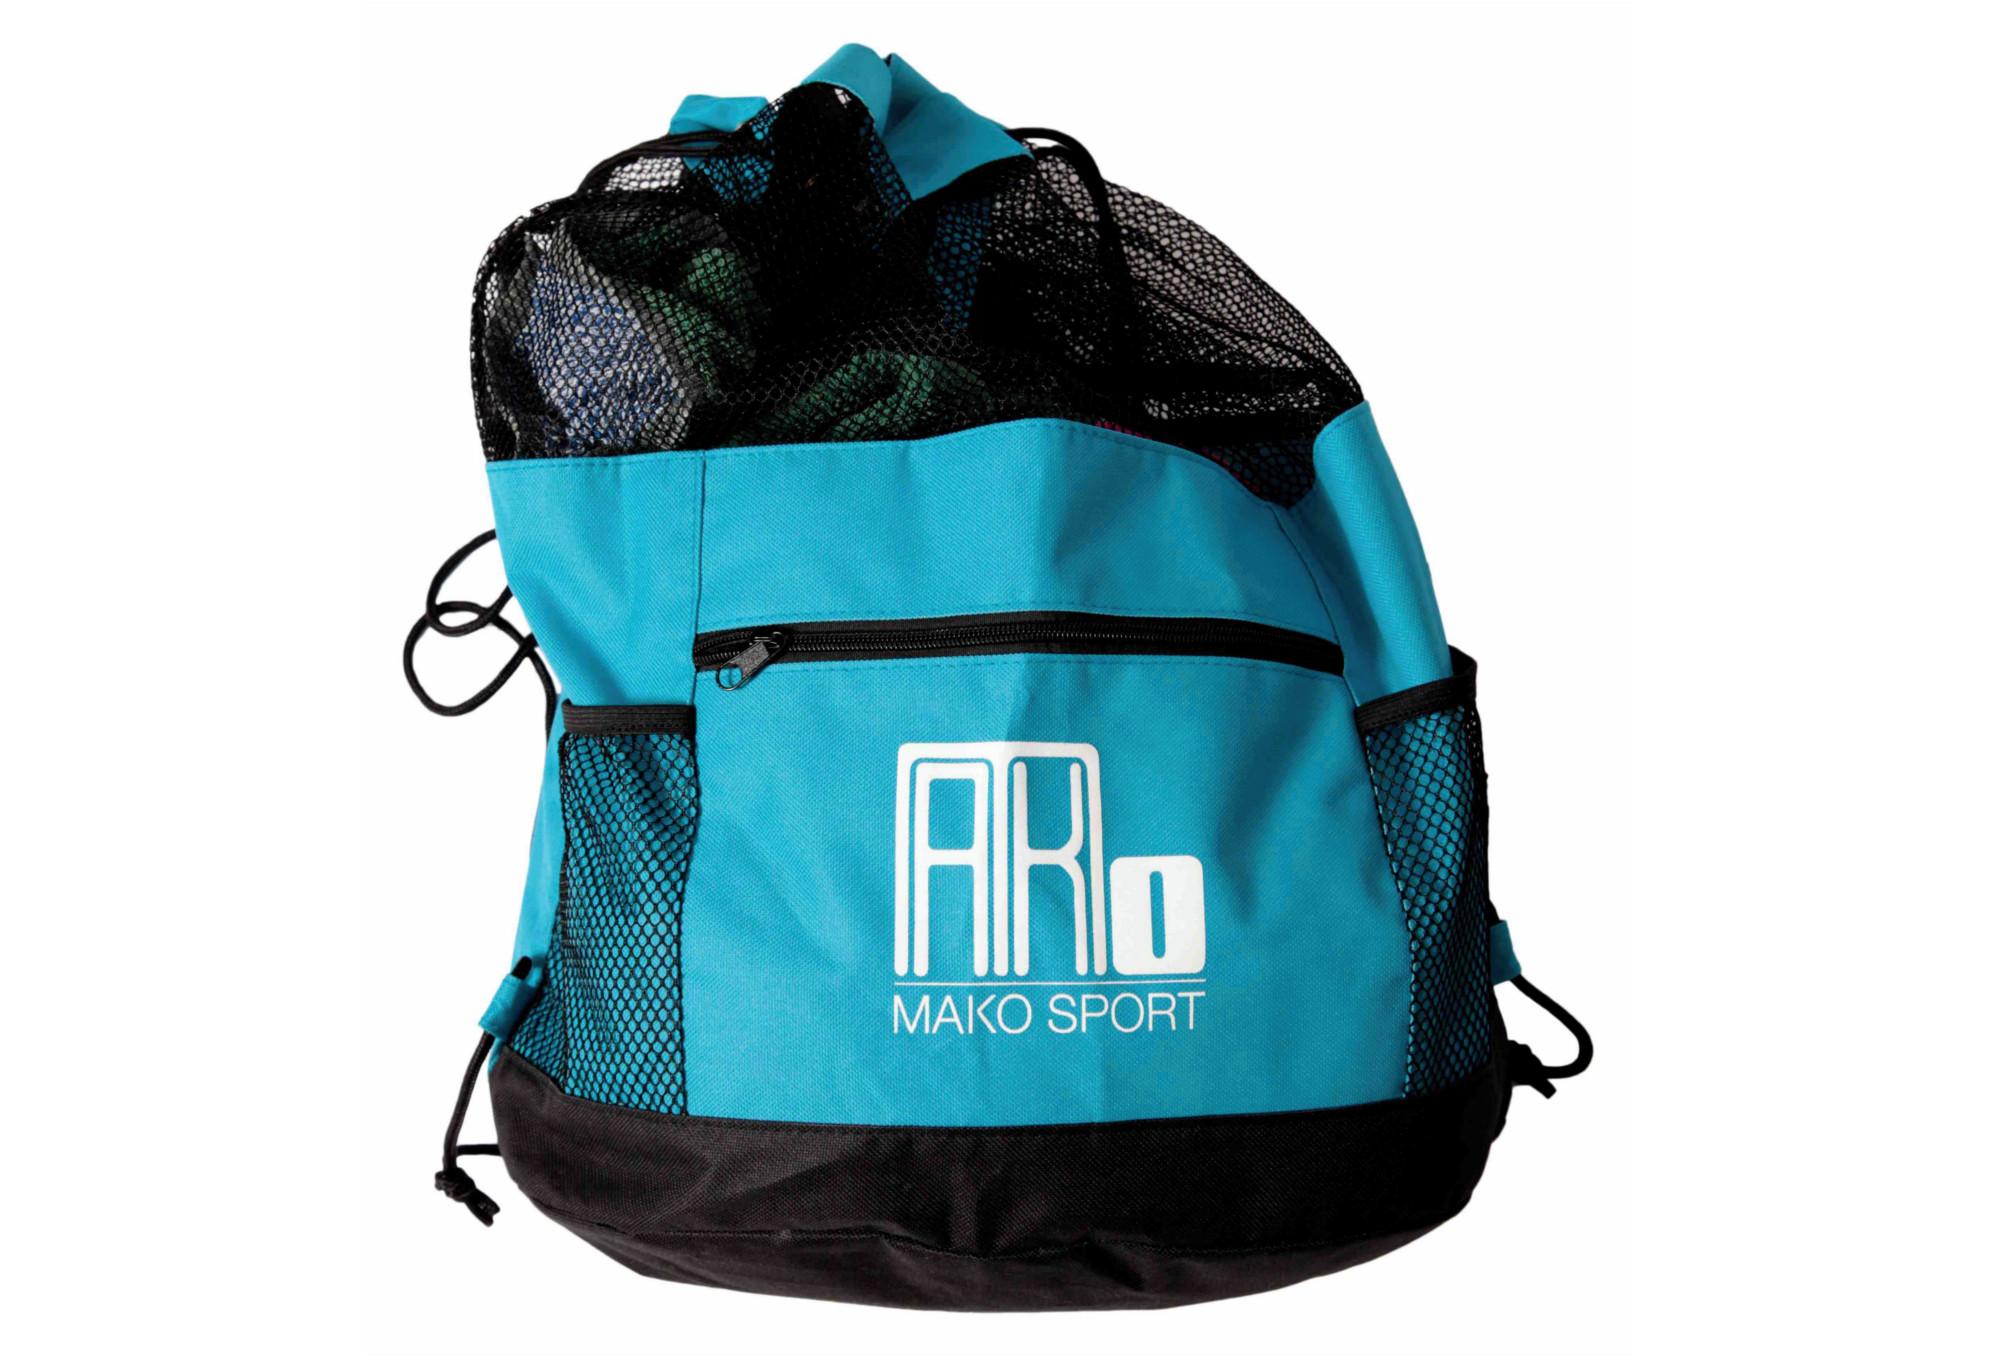 sac de piscine mako mesh bag bleu. Black Bedroom Furniture Sets. Home Design Ideas